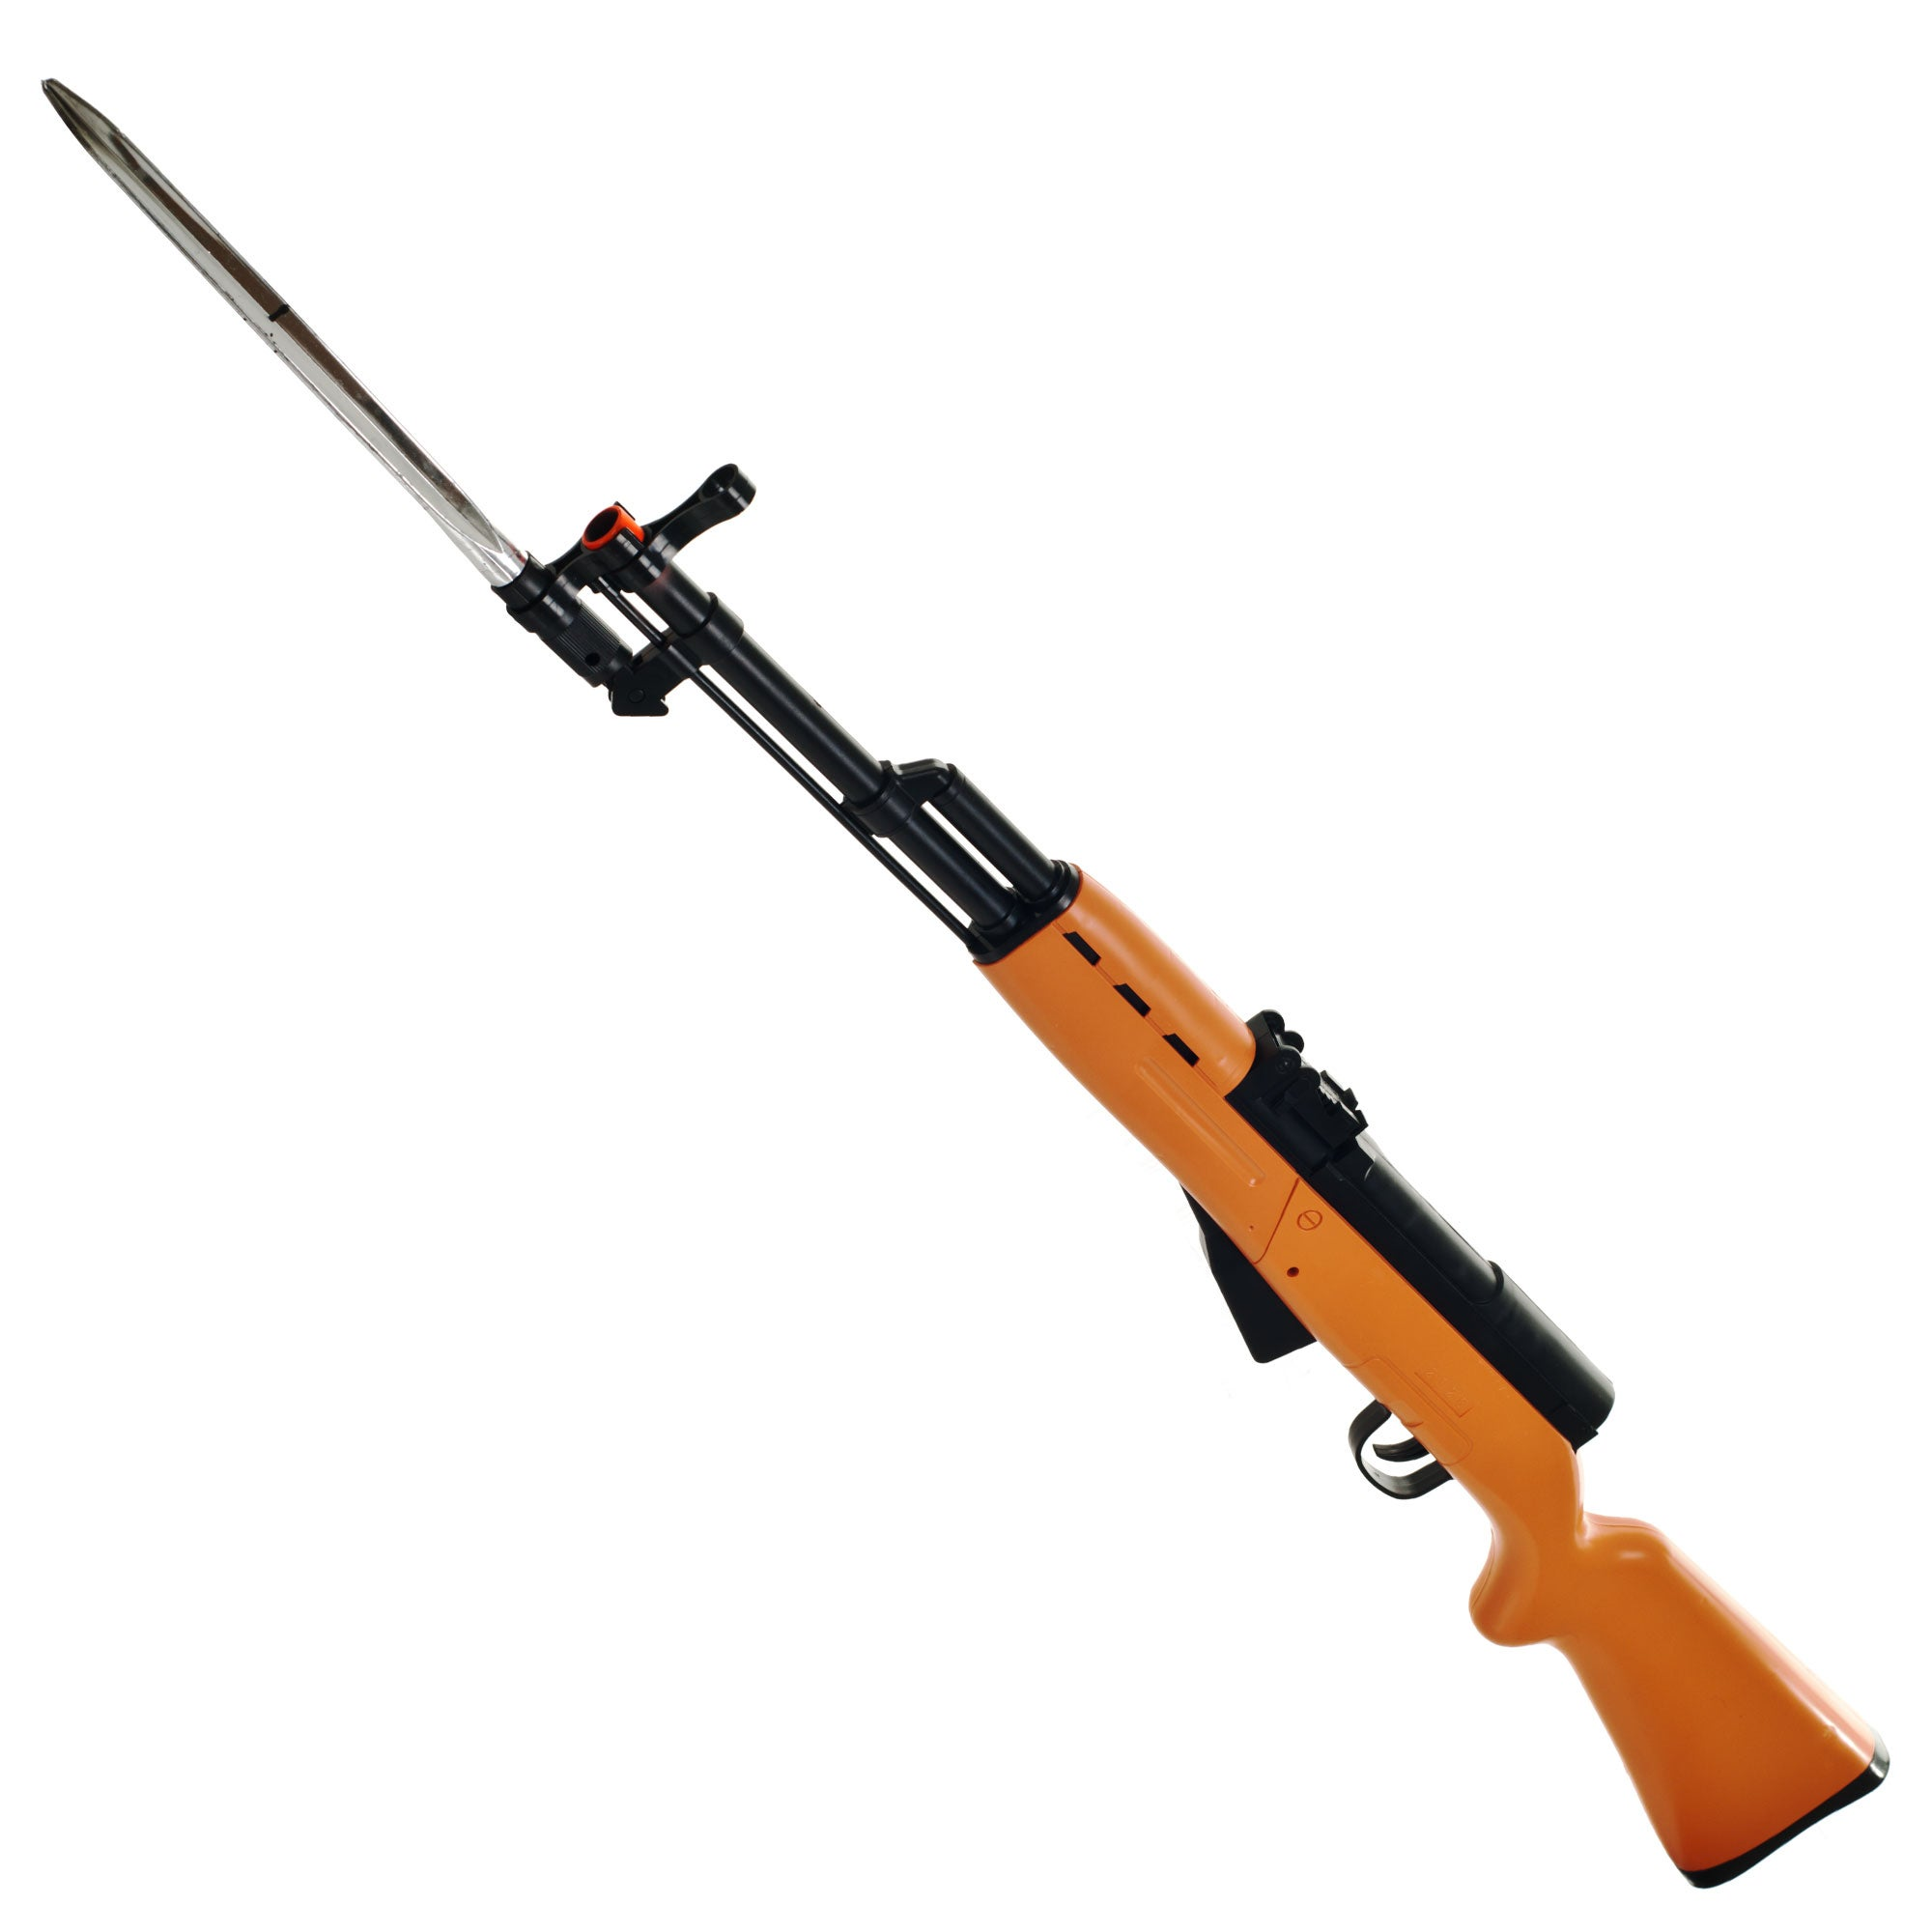 Whetstone Black/Orange Plastic/Metal AK47 Airsoft Rifle Replica